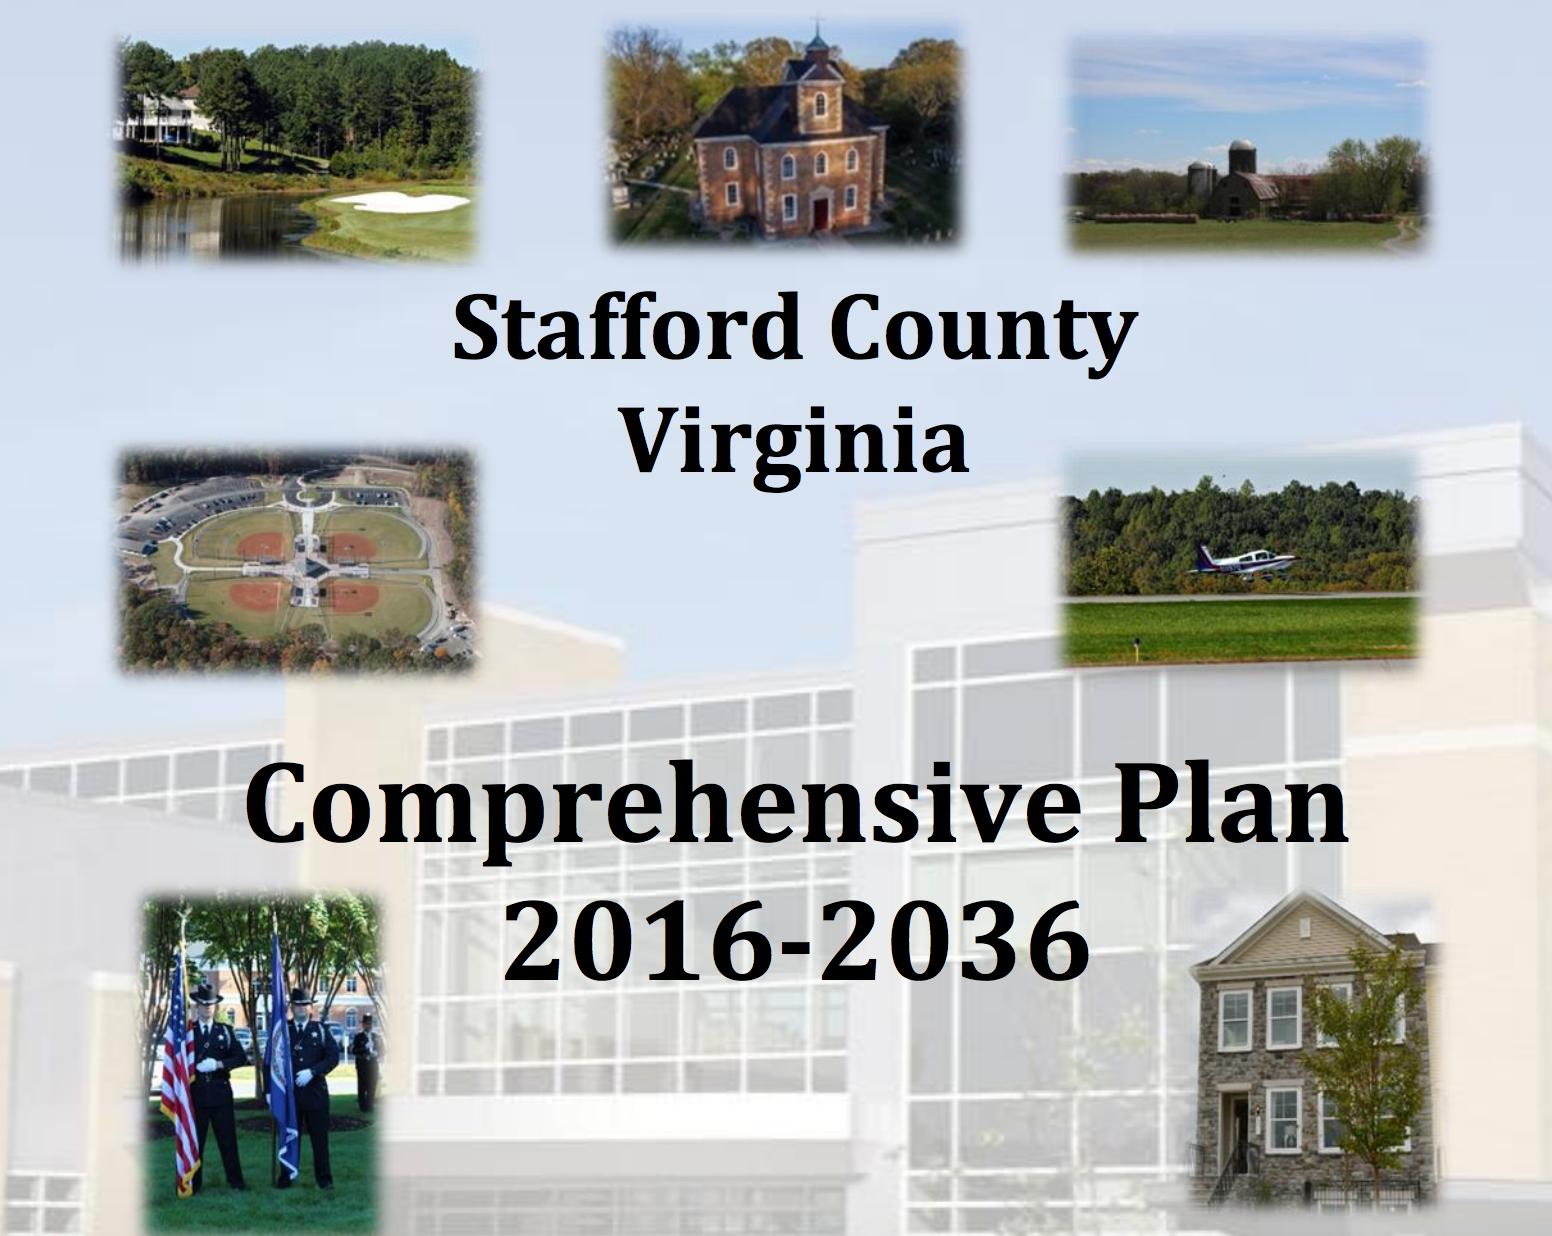 Comprehensive Plan 2016-2036